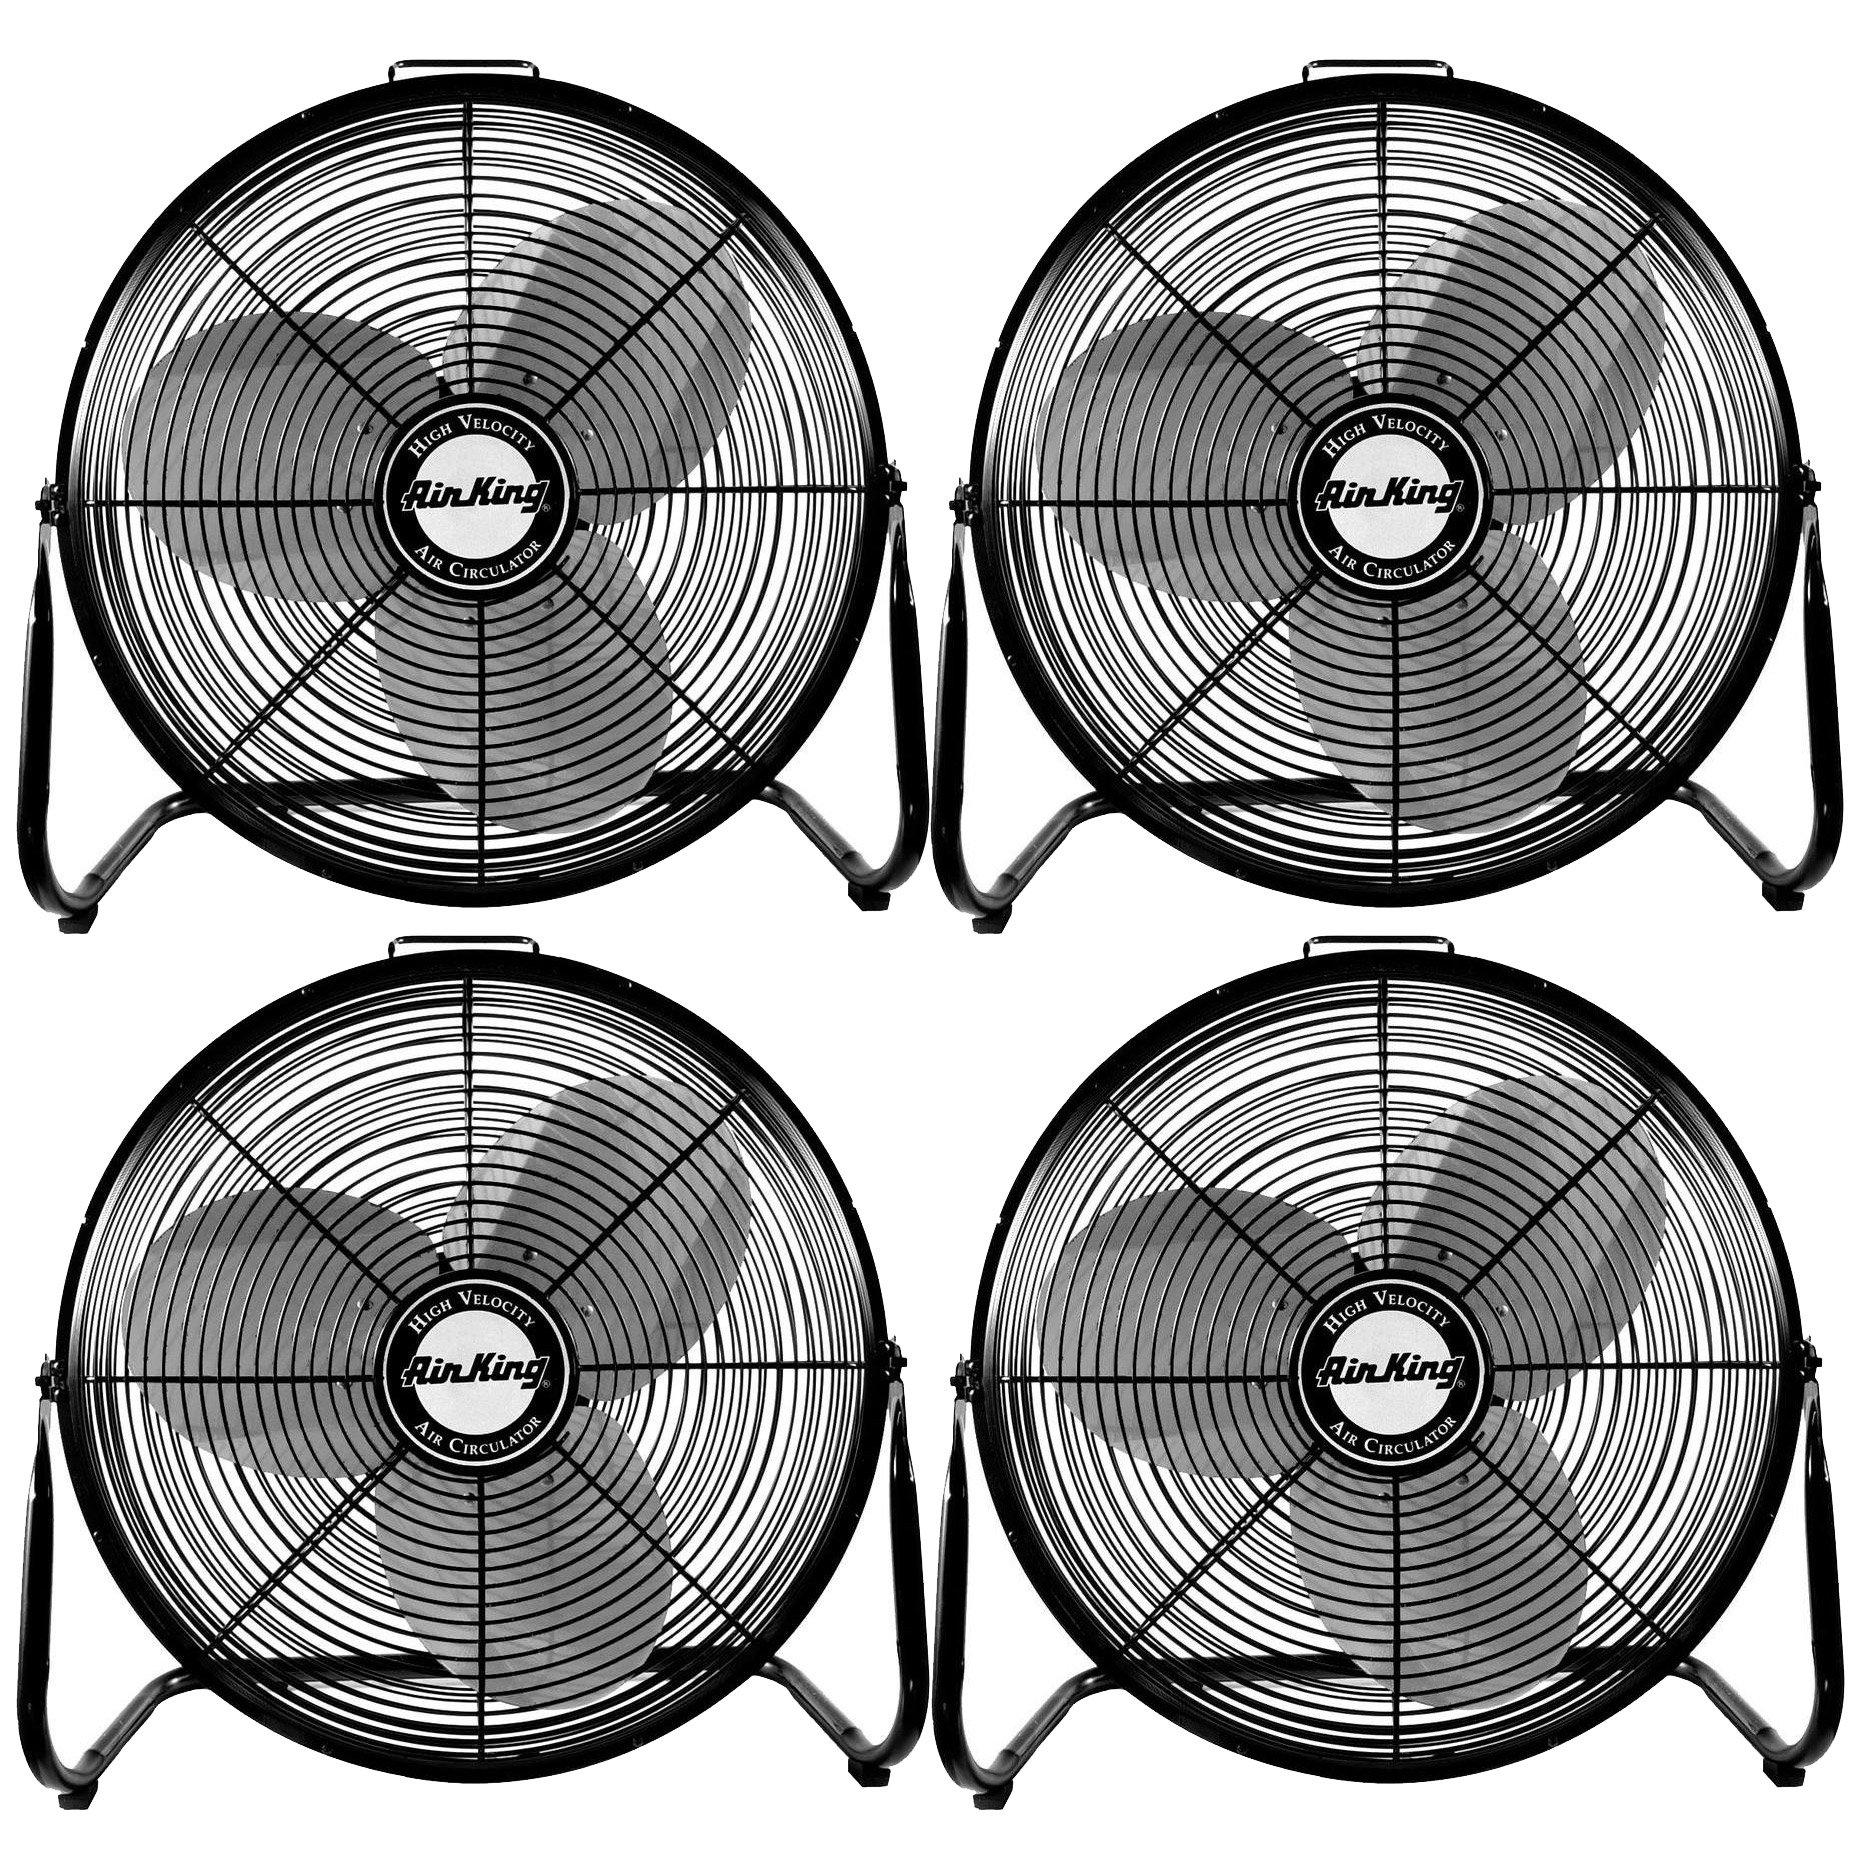 "Air King 18"" 1/6 HP 3 Speed Heavy Duty Portable Industrial Floor Fan (4 Pack)"